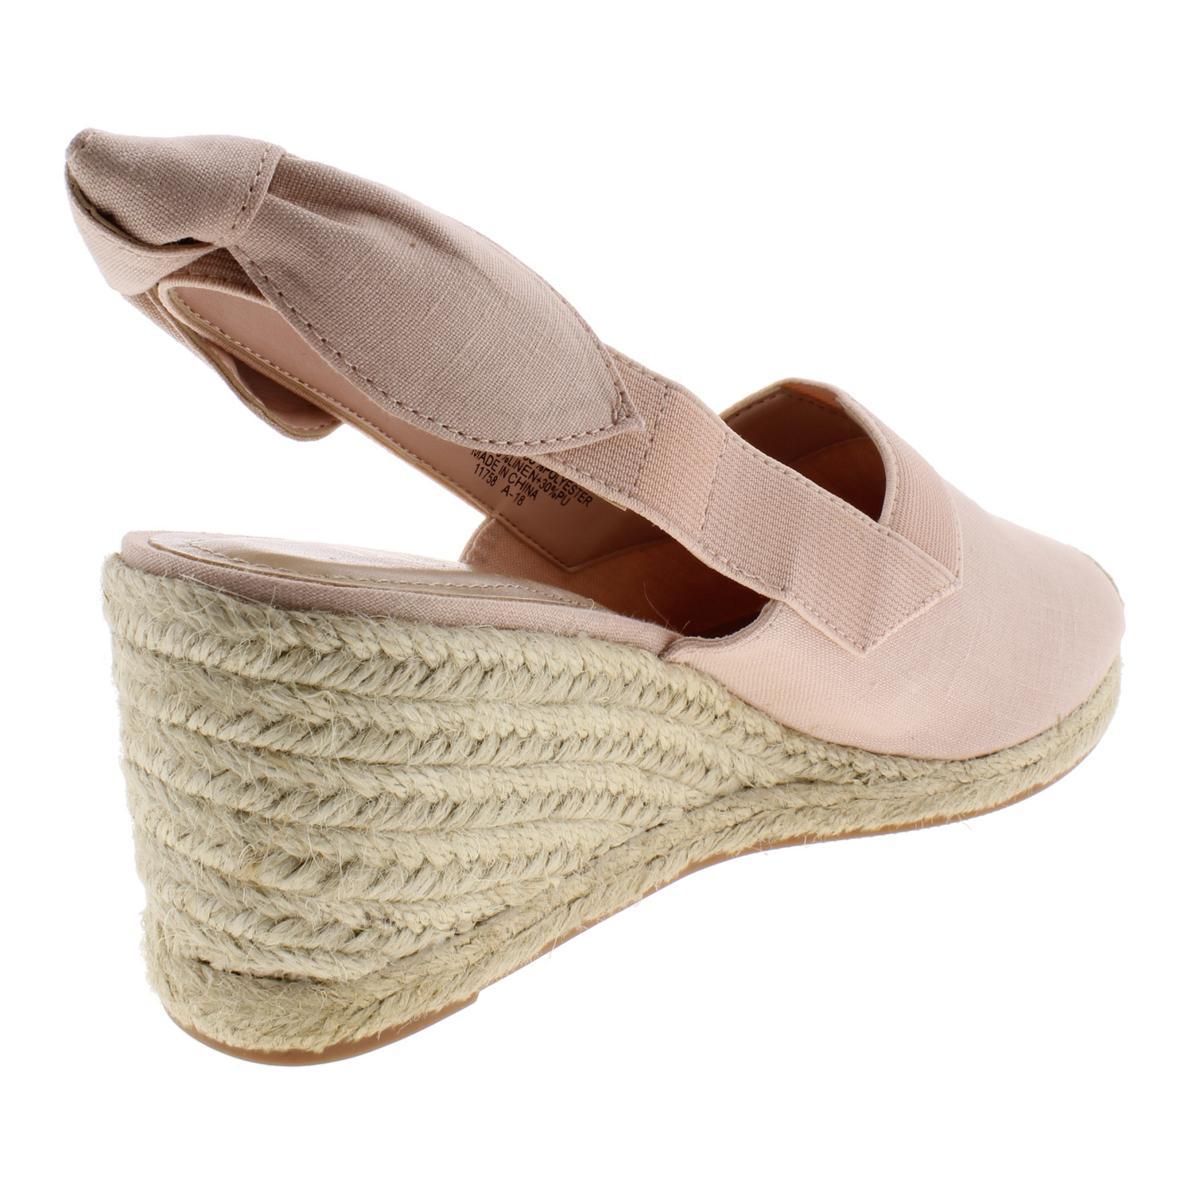 Lauren-Ralph-Lauren-Womens-Helma-Textured-Sandals-Espadrilles-Wedges-BHFO-6966 thumbnail 6